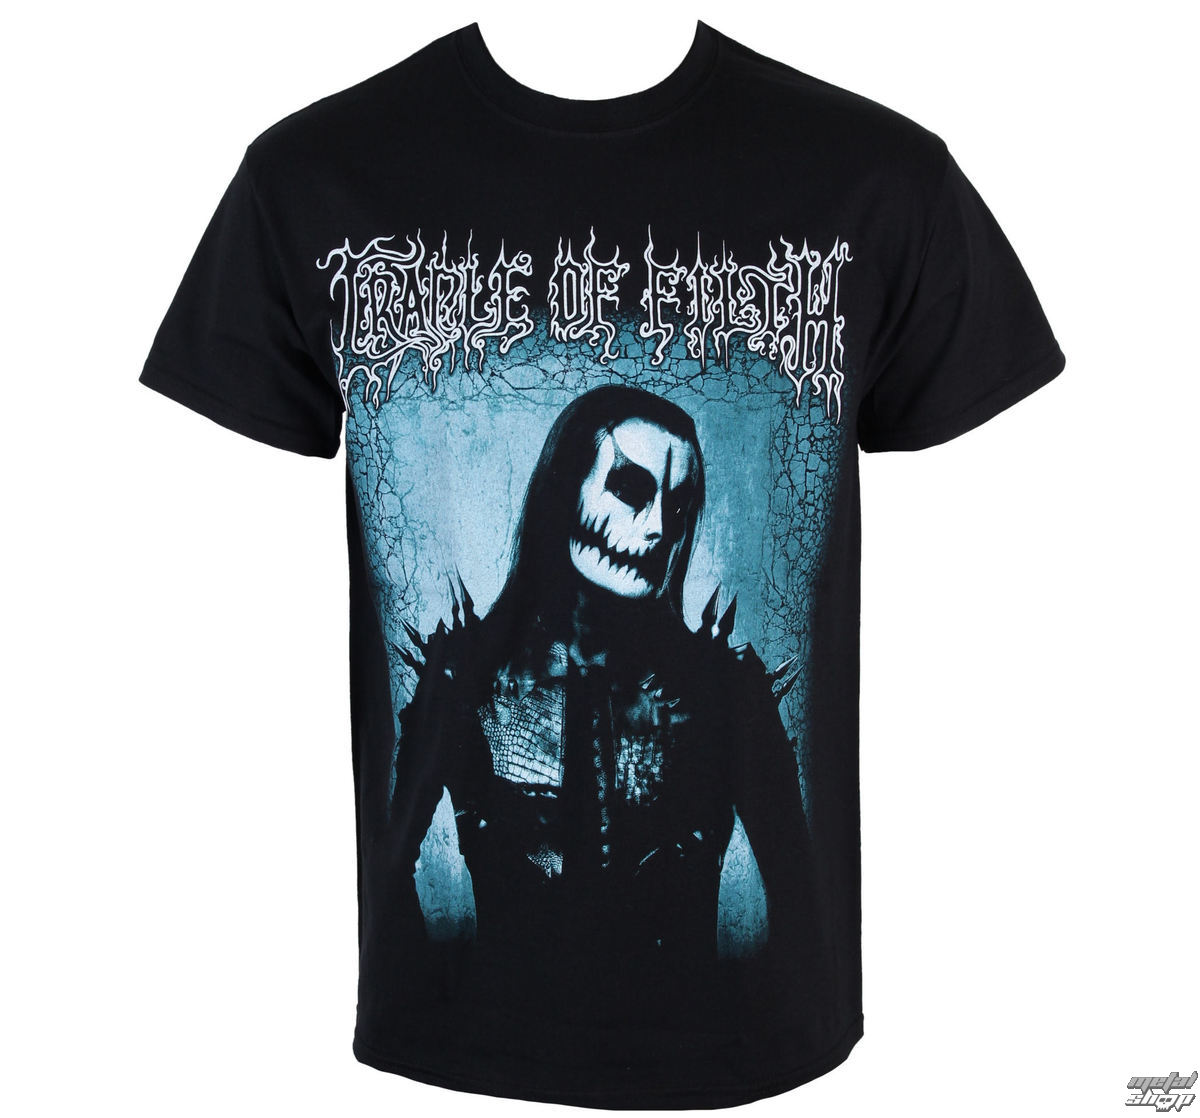 tričko pánské Cradle Of Filth - Haunted,Hunted,Feared And Shunned - RAZAMATAZ - ST1973